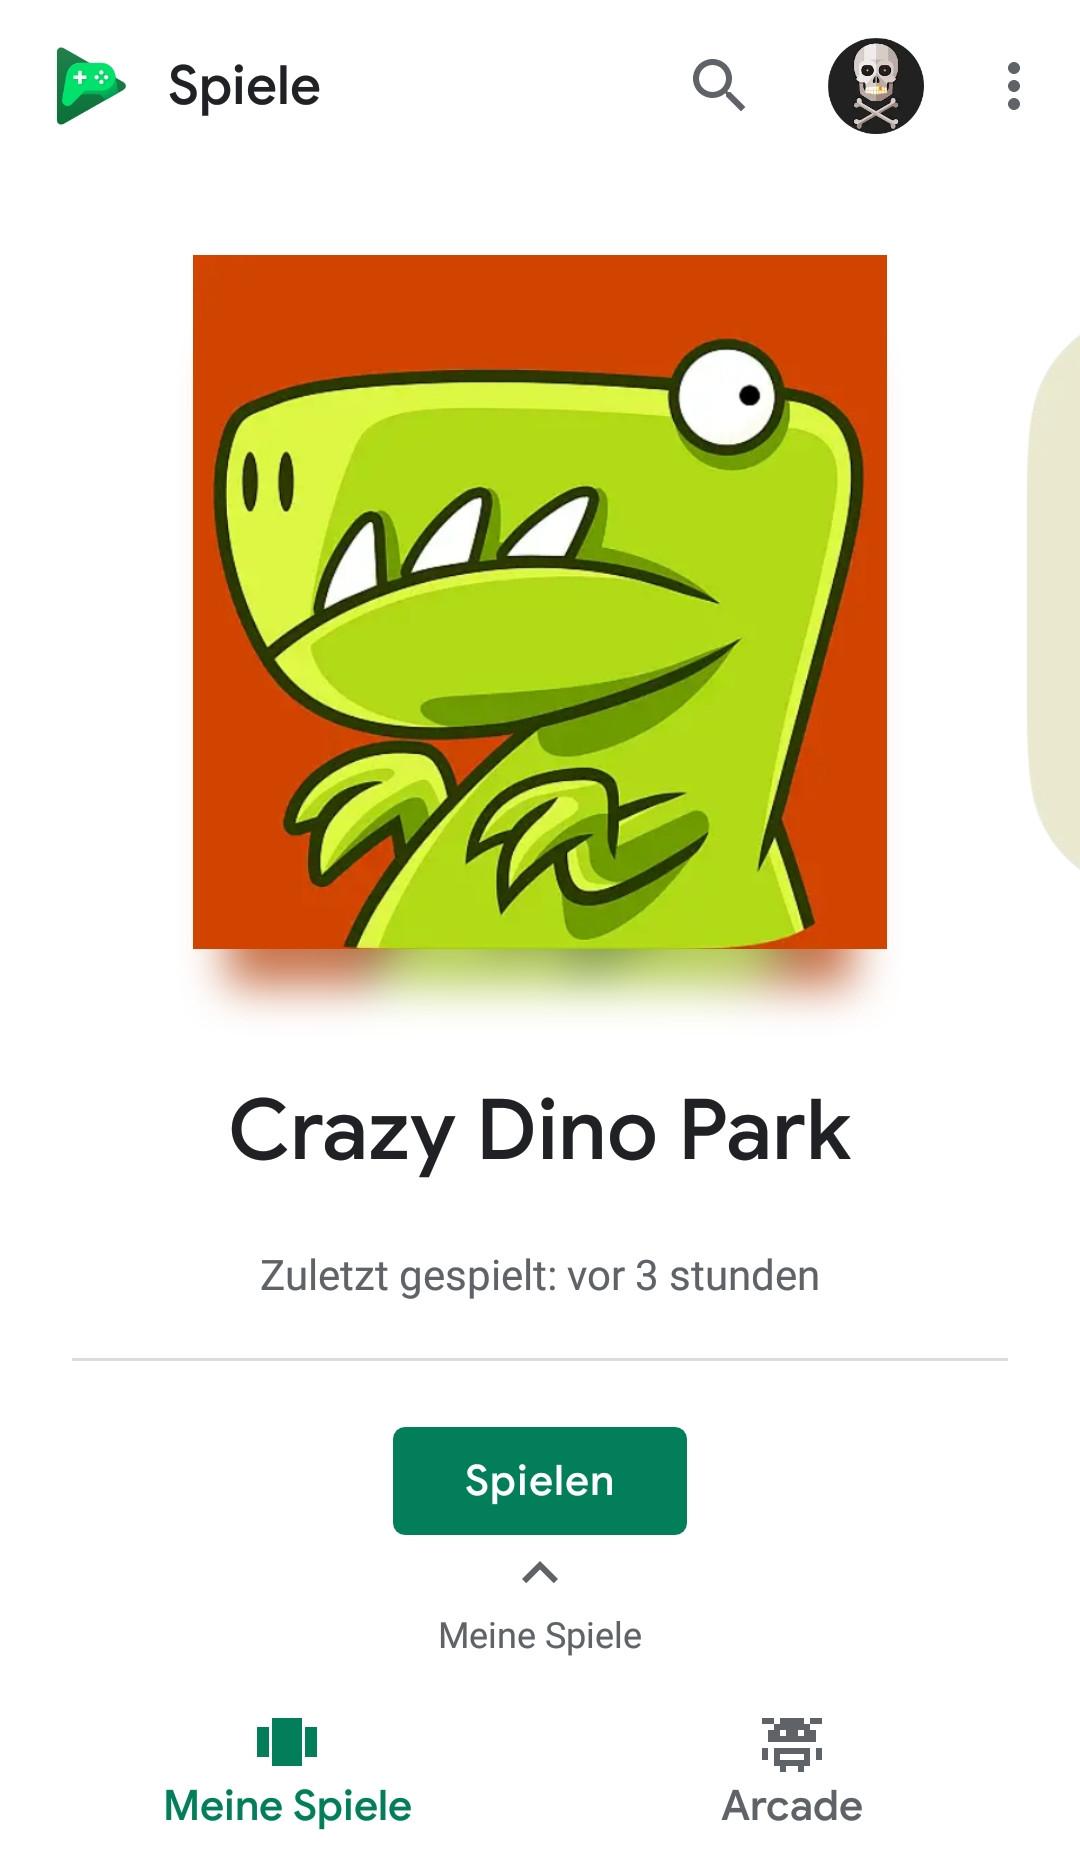 Screenshot 1 - Google Play Games (APK)